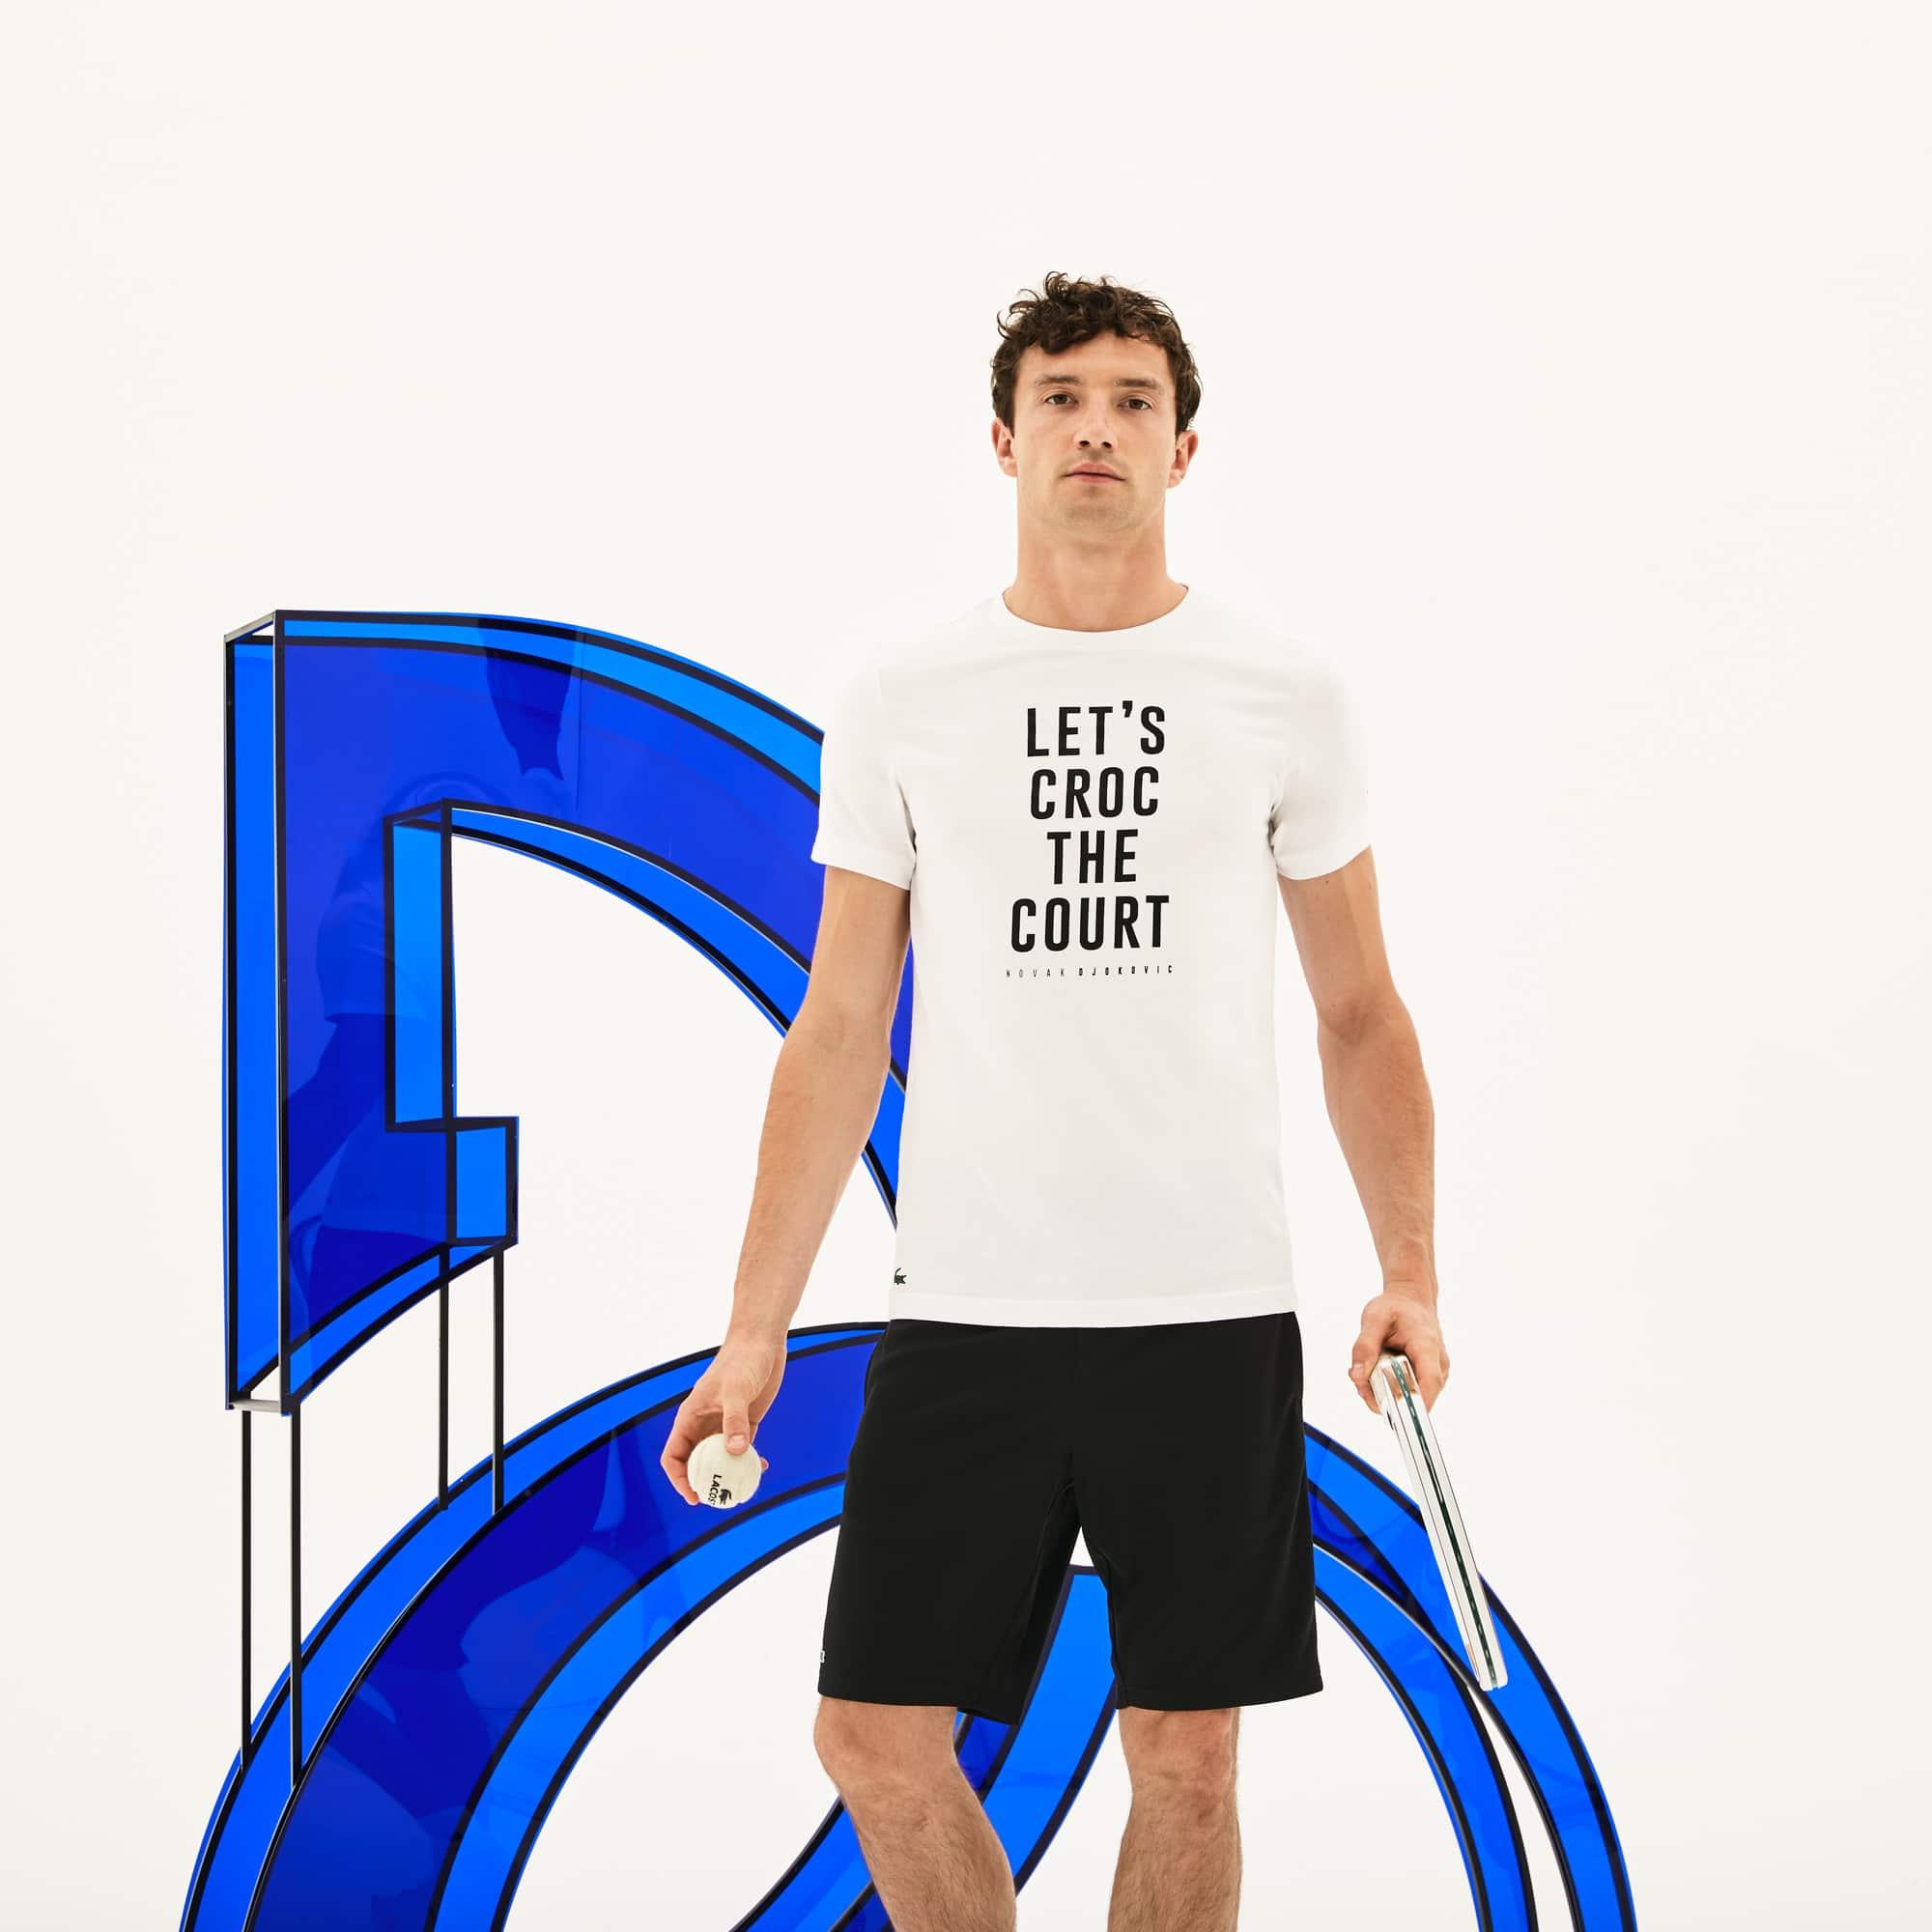 Lacoste SPORT NOVAK DJOKOVIC SUPPORT WITH STYLE - OFF COURT COLLECTION-T-Shirt heren ronde hals technische jersey met letters